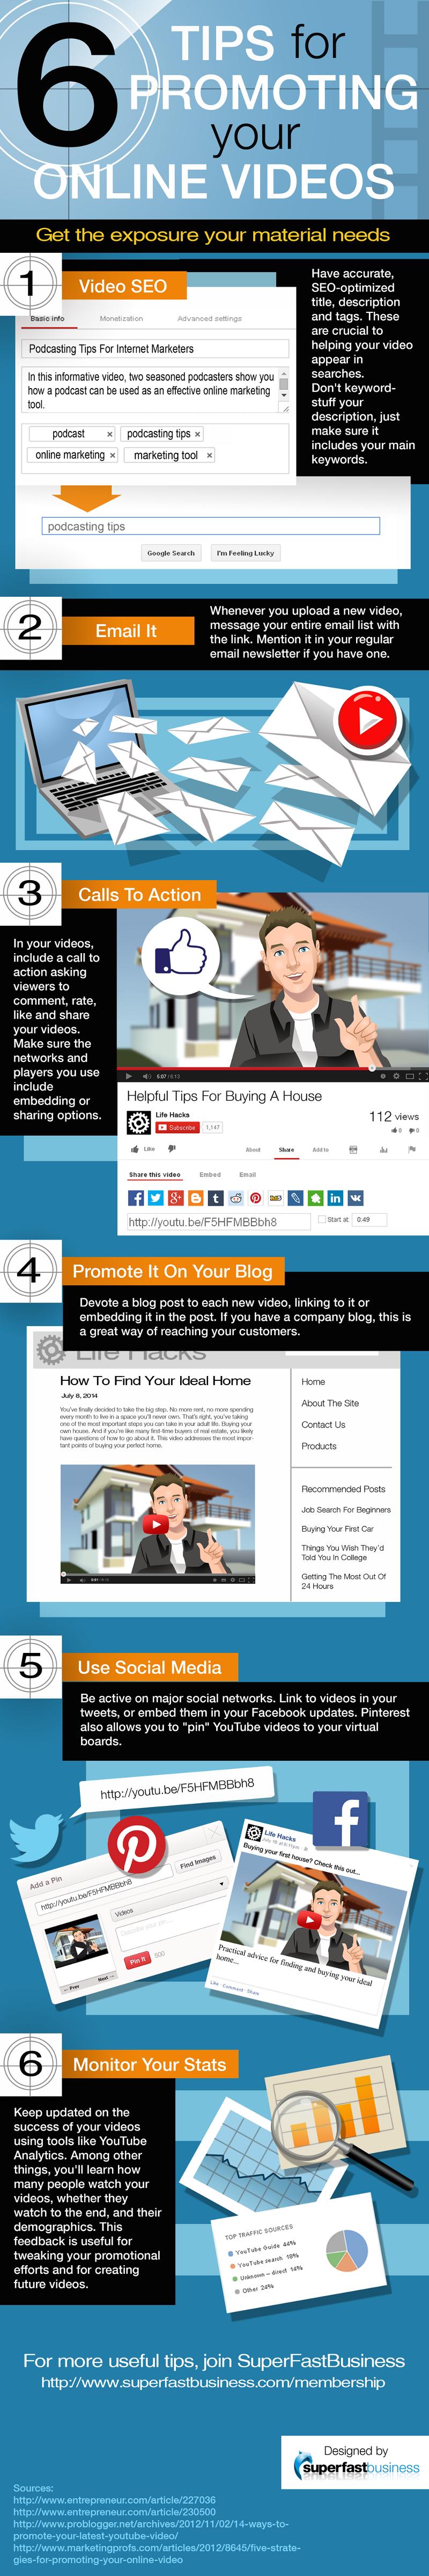 Video-Marketing-Strategies